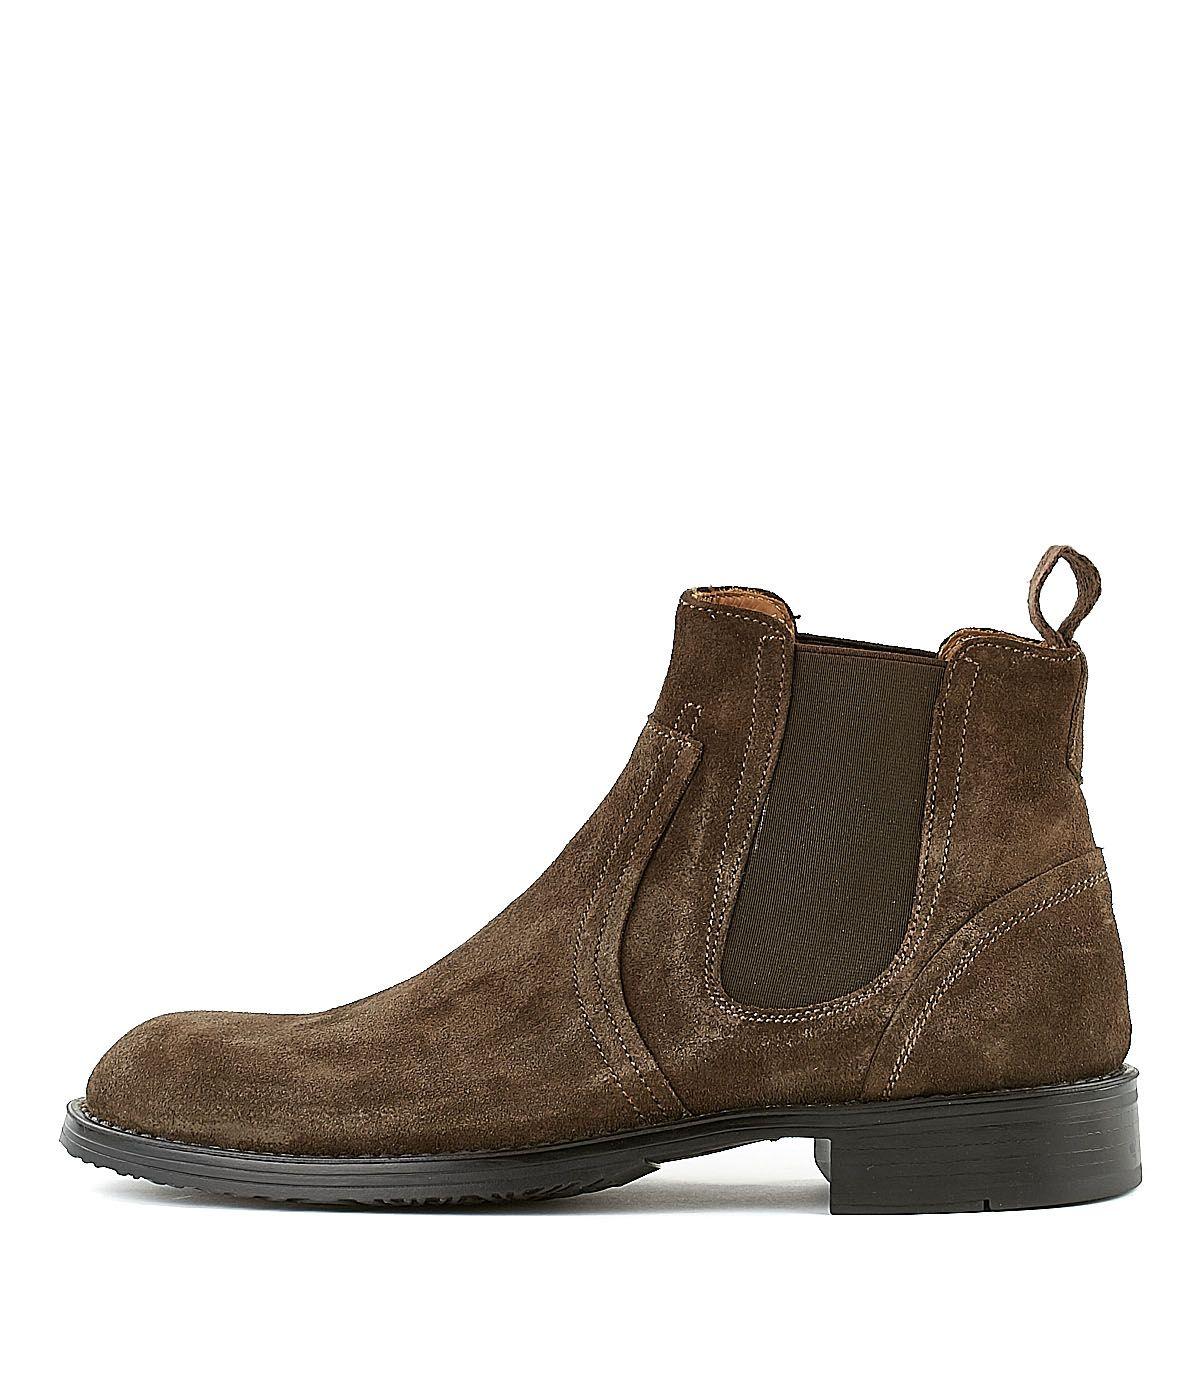 free shipping 92f94 9061d MORANDI-Chelsea-Boot 4267-Men-Braun-Rossi&Co #christmas ...